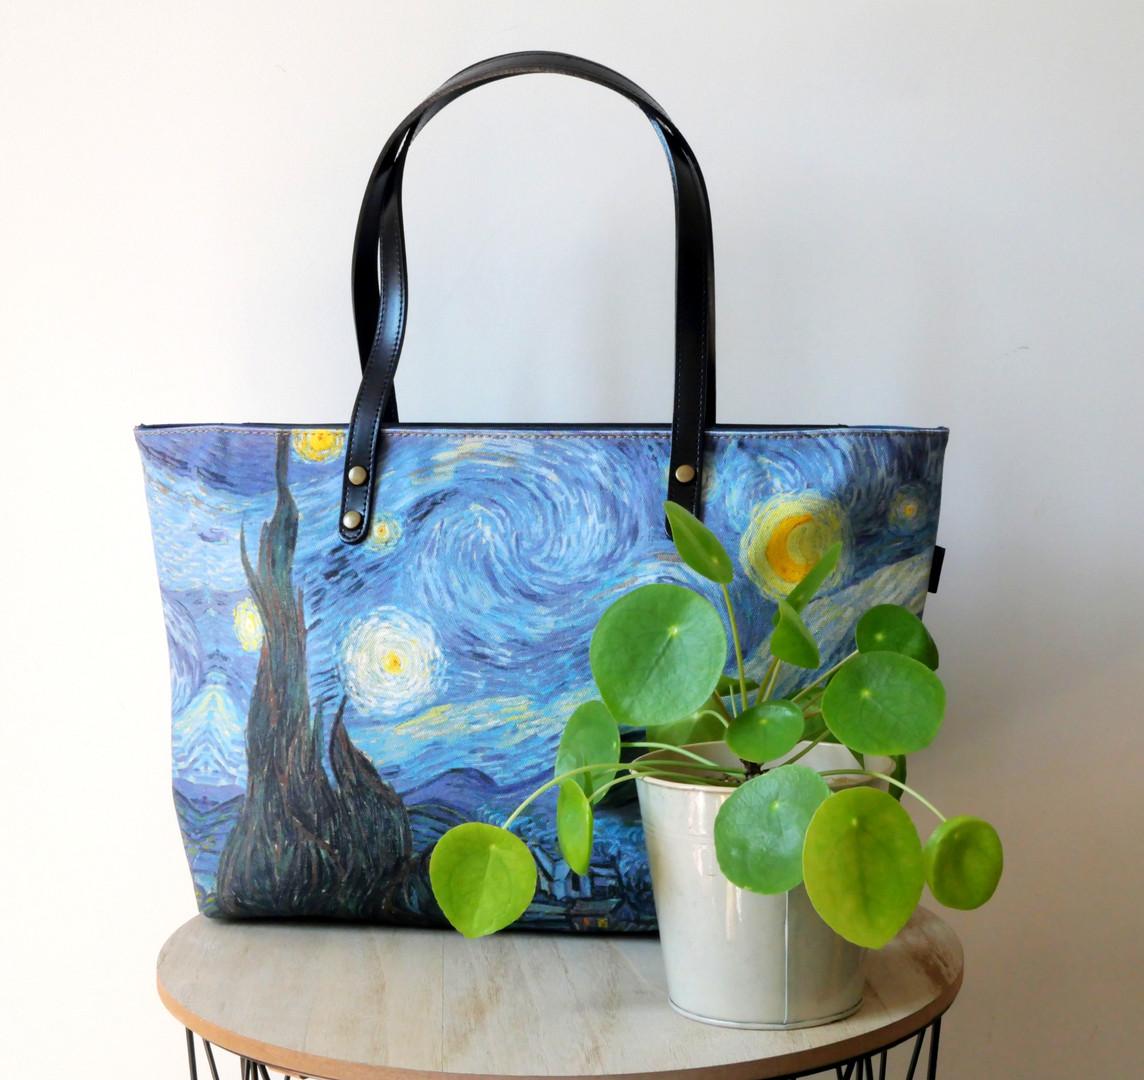 Maison Martin par Royal Tapisserie sac shopping Nuit Etoilée de Van Gogh (référence 8975V6)